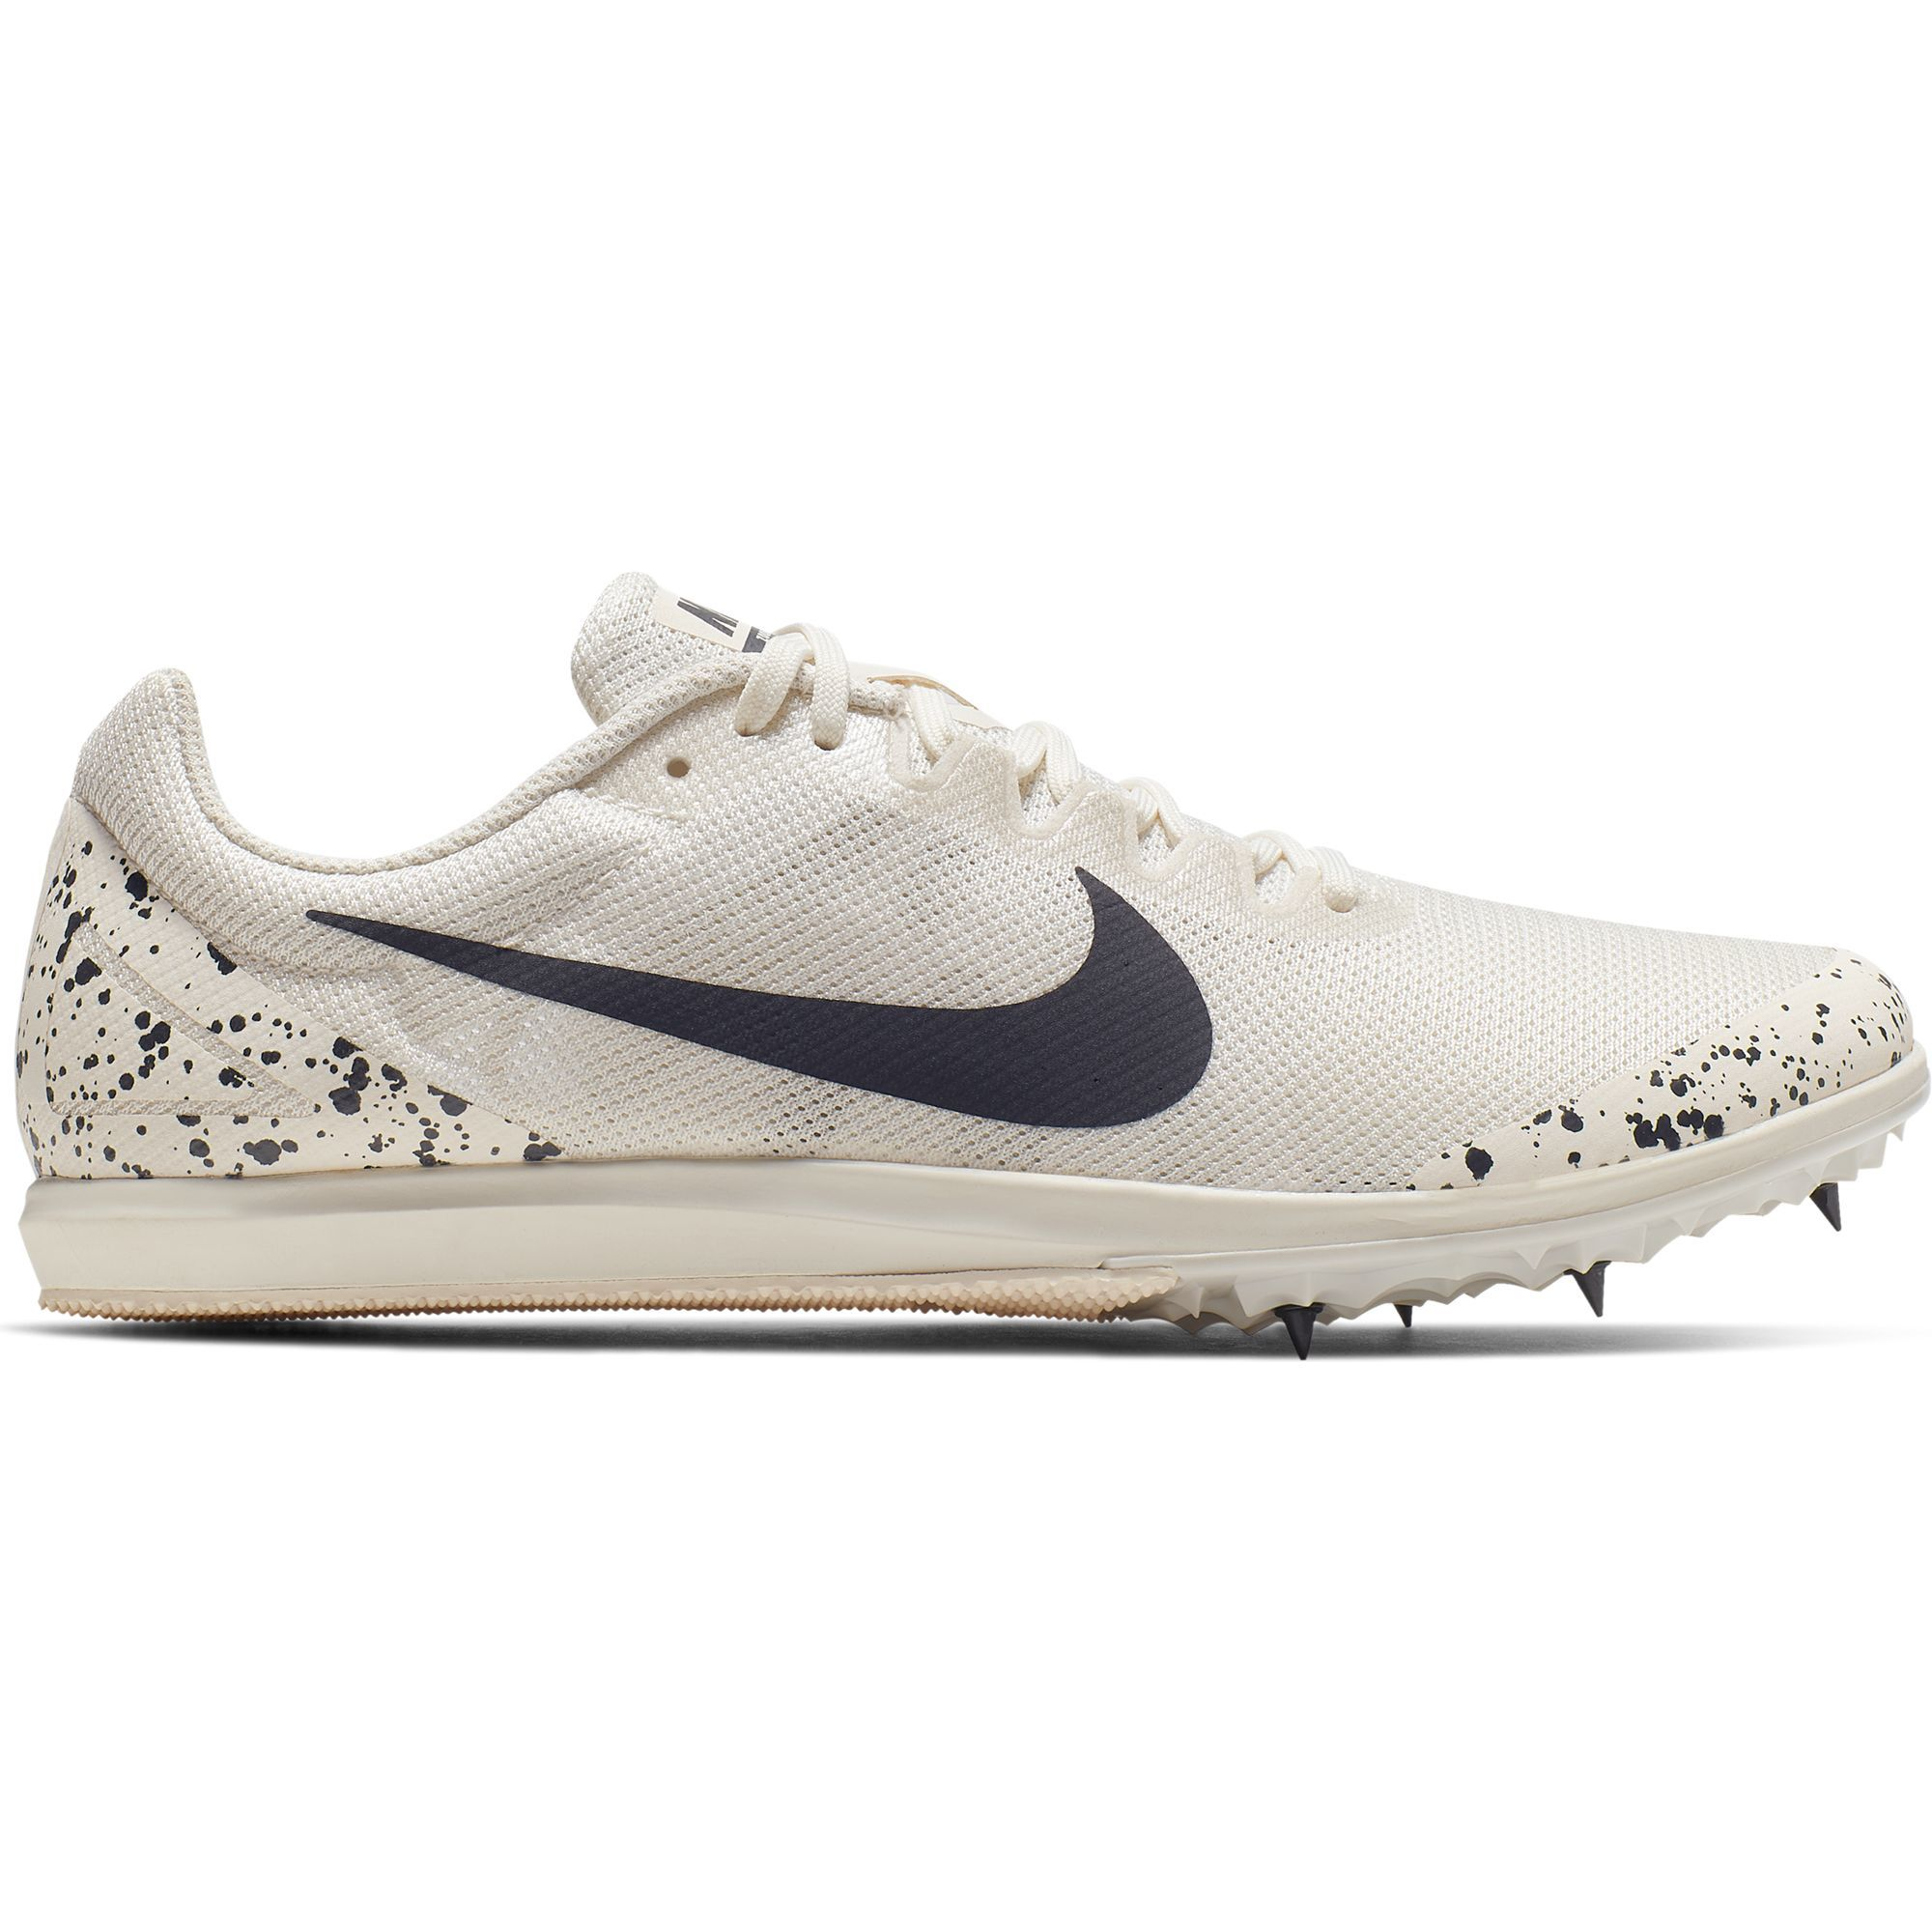 Nike Zoom Rival D 10 (Weiß Grau)